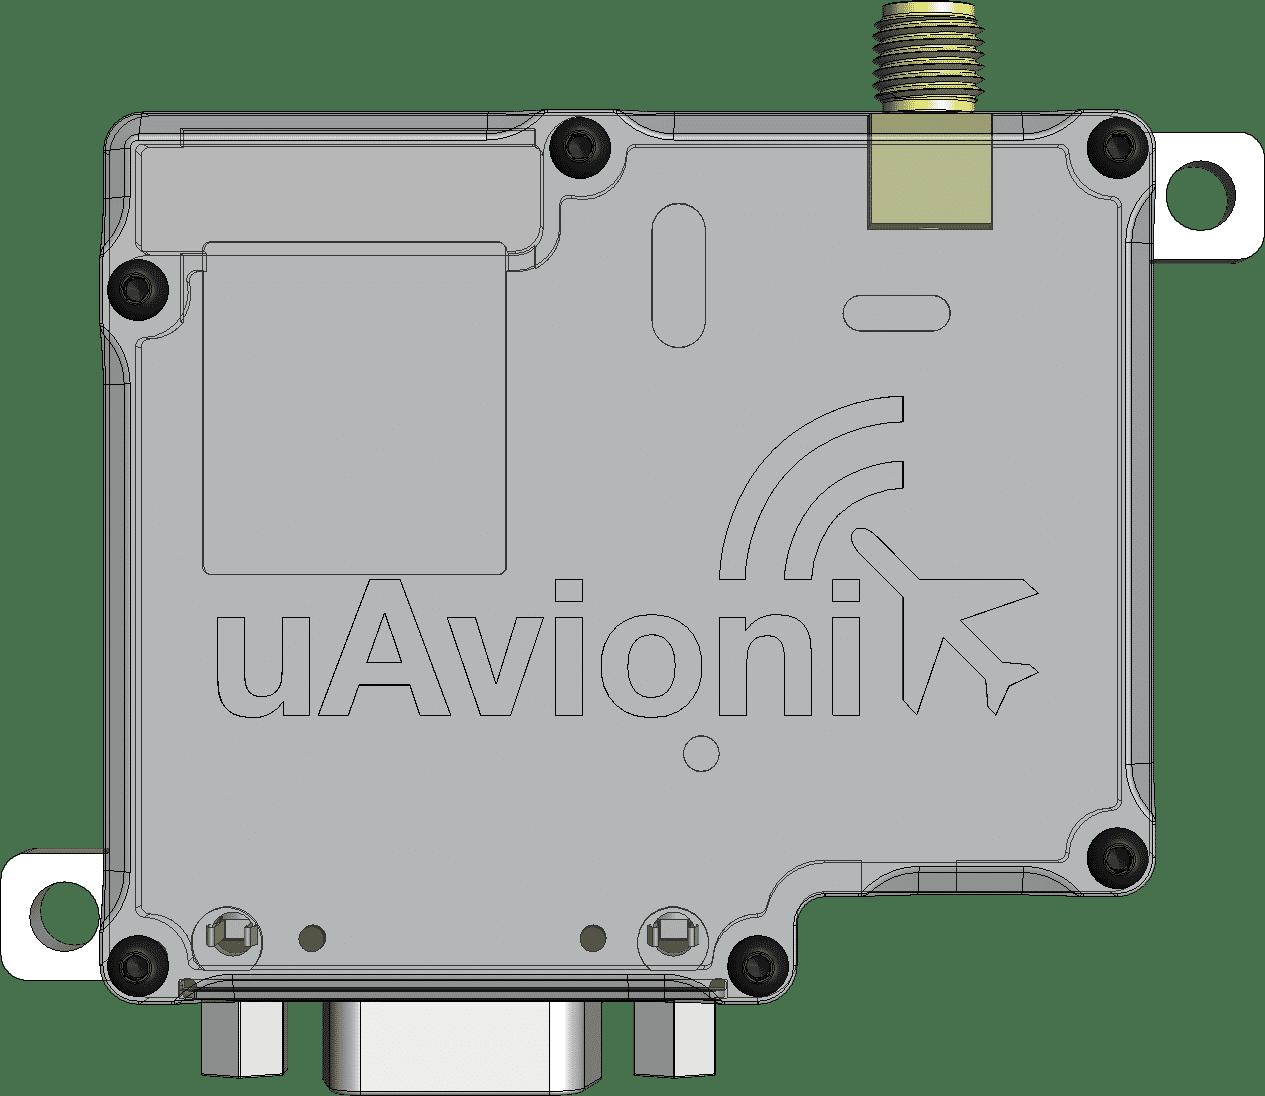 uAvionix echoESX Mode S Transponder